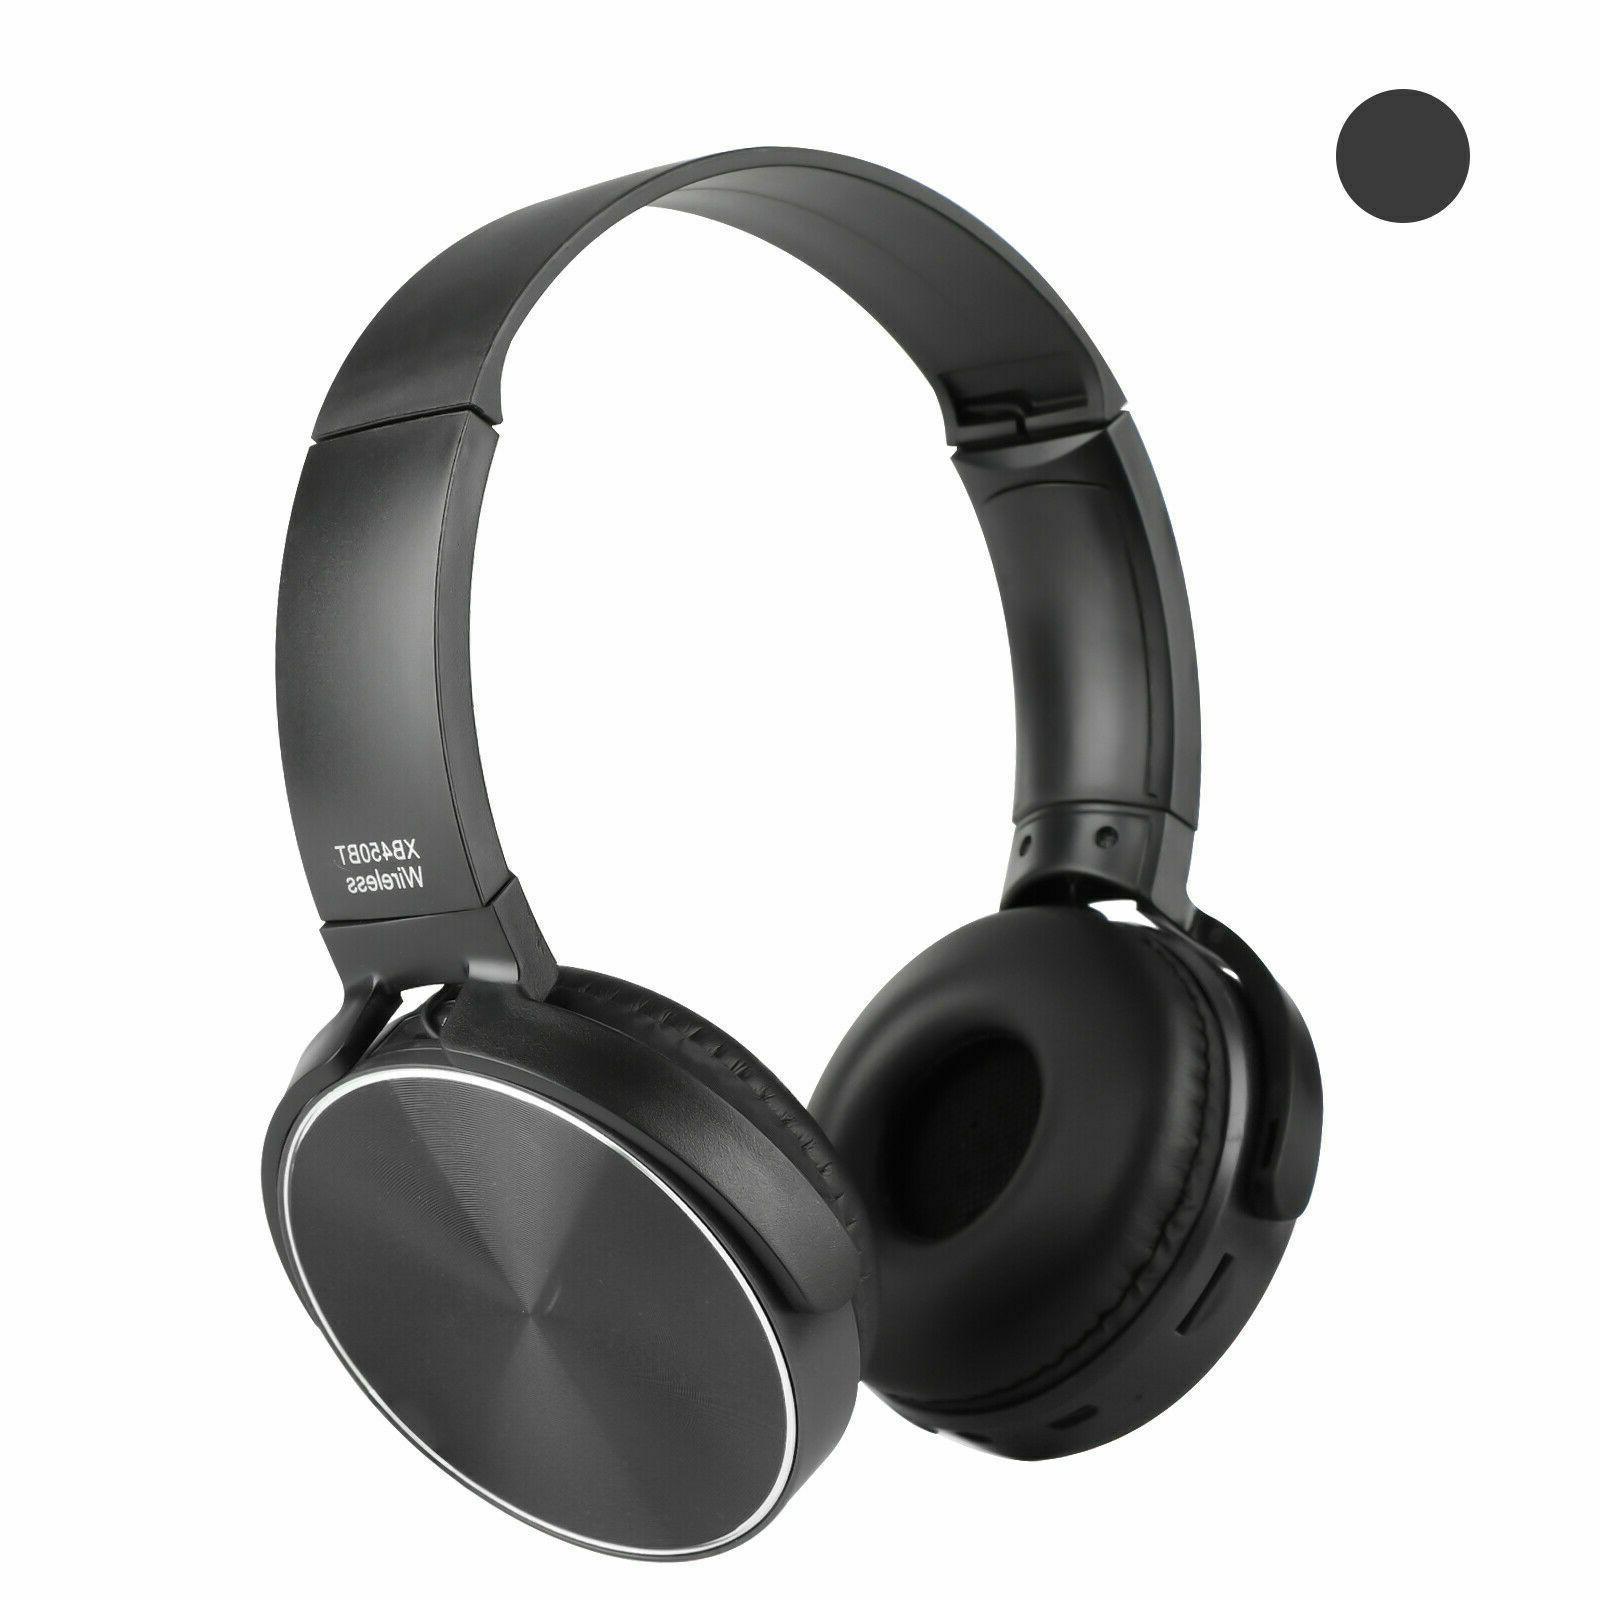 Super Headphones Foldable Stereo Headsets